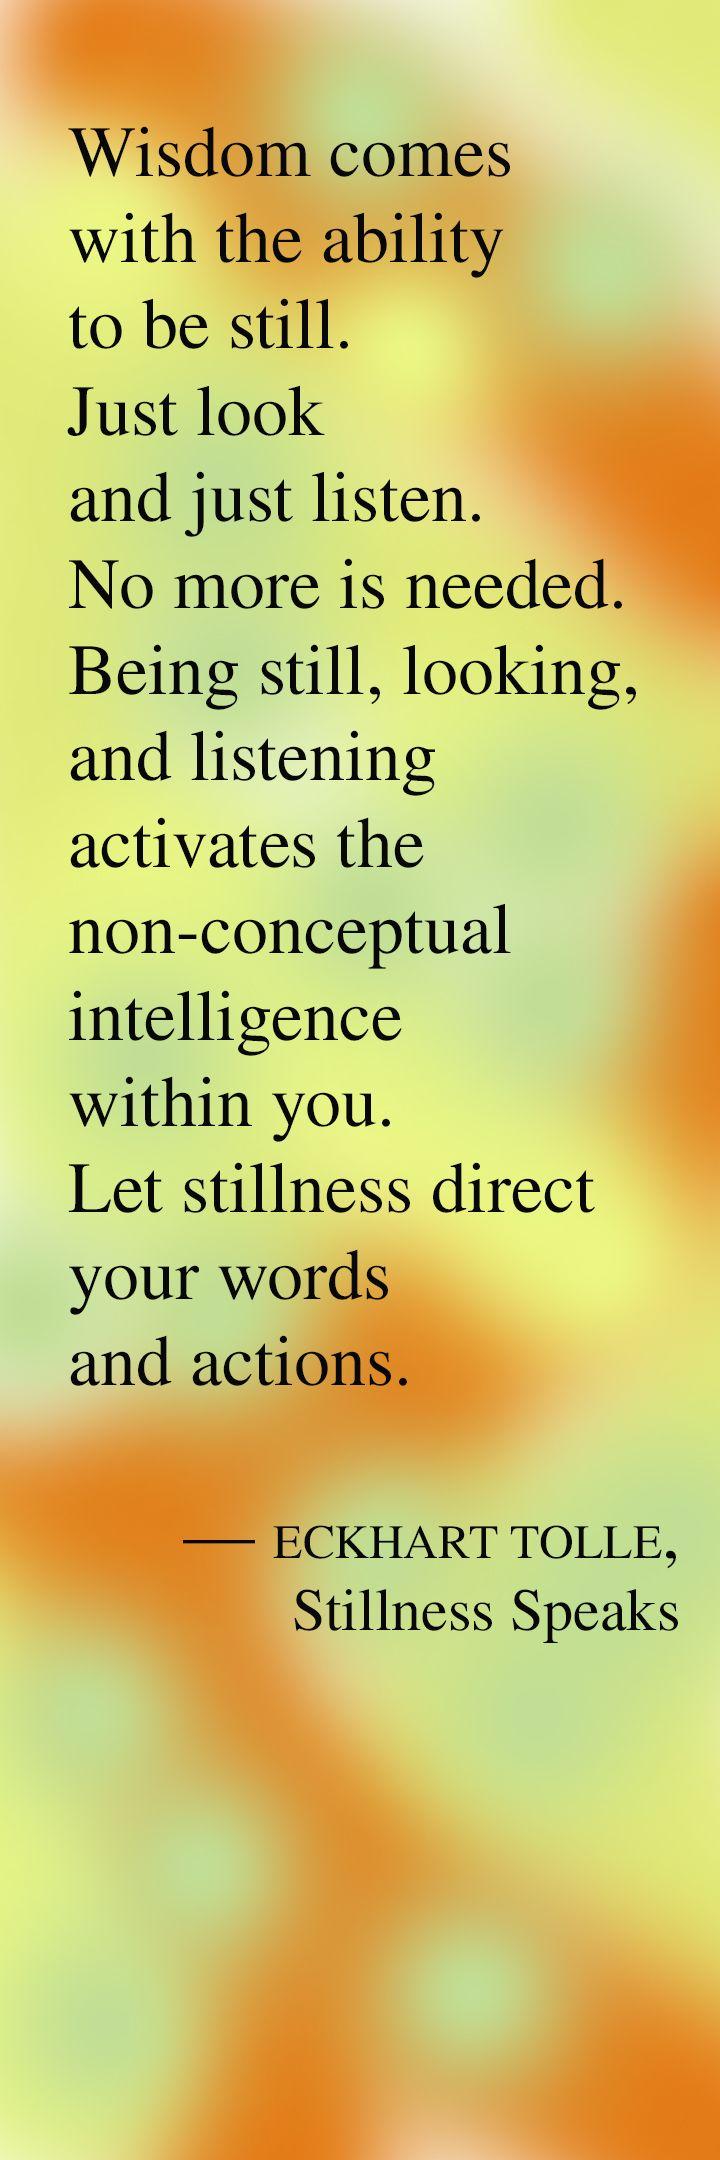 Eckhart Tolle -- Stillness Speaks -- repinned by http://Transforming-My-Life.com